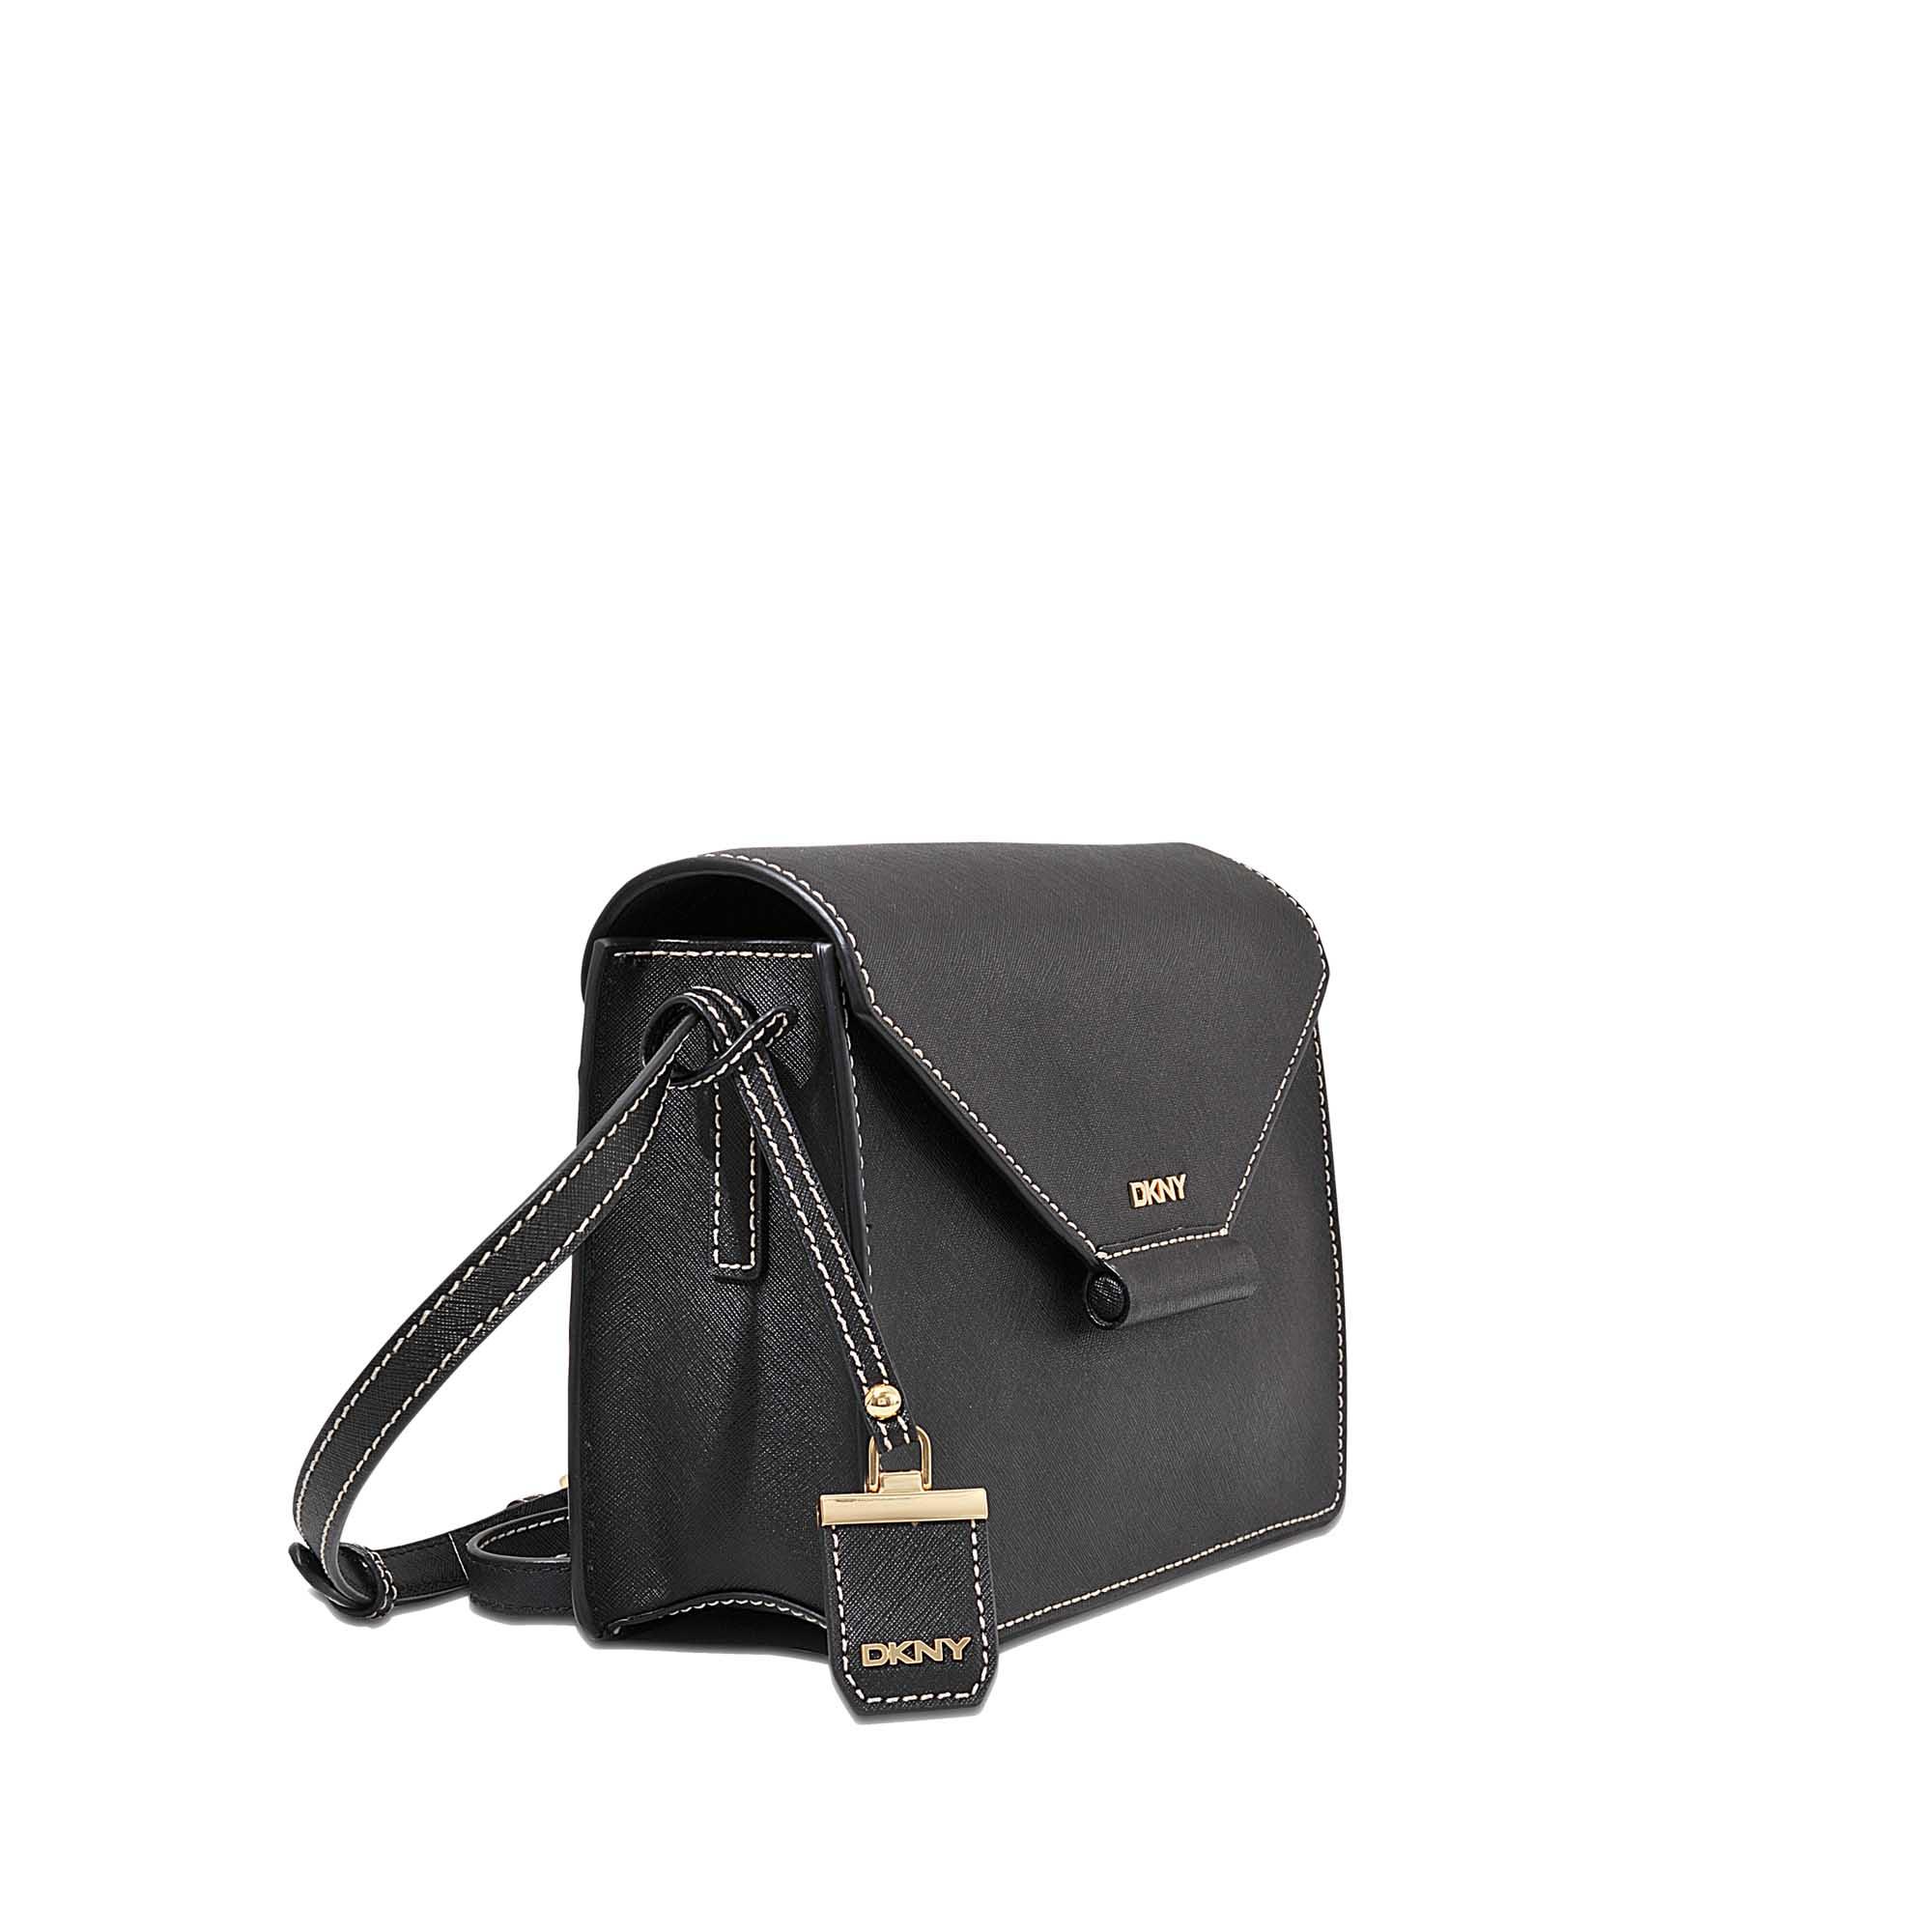 Bryant flap cross body bag - Black DKNY 6FyWoZYl